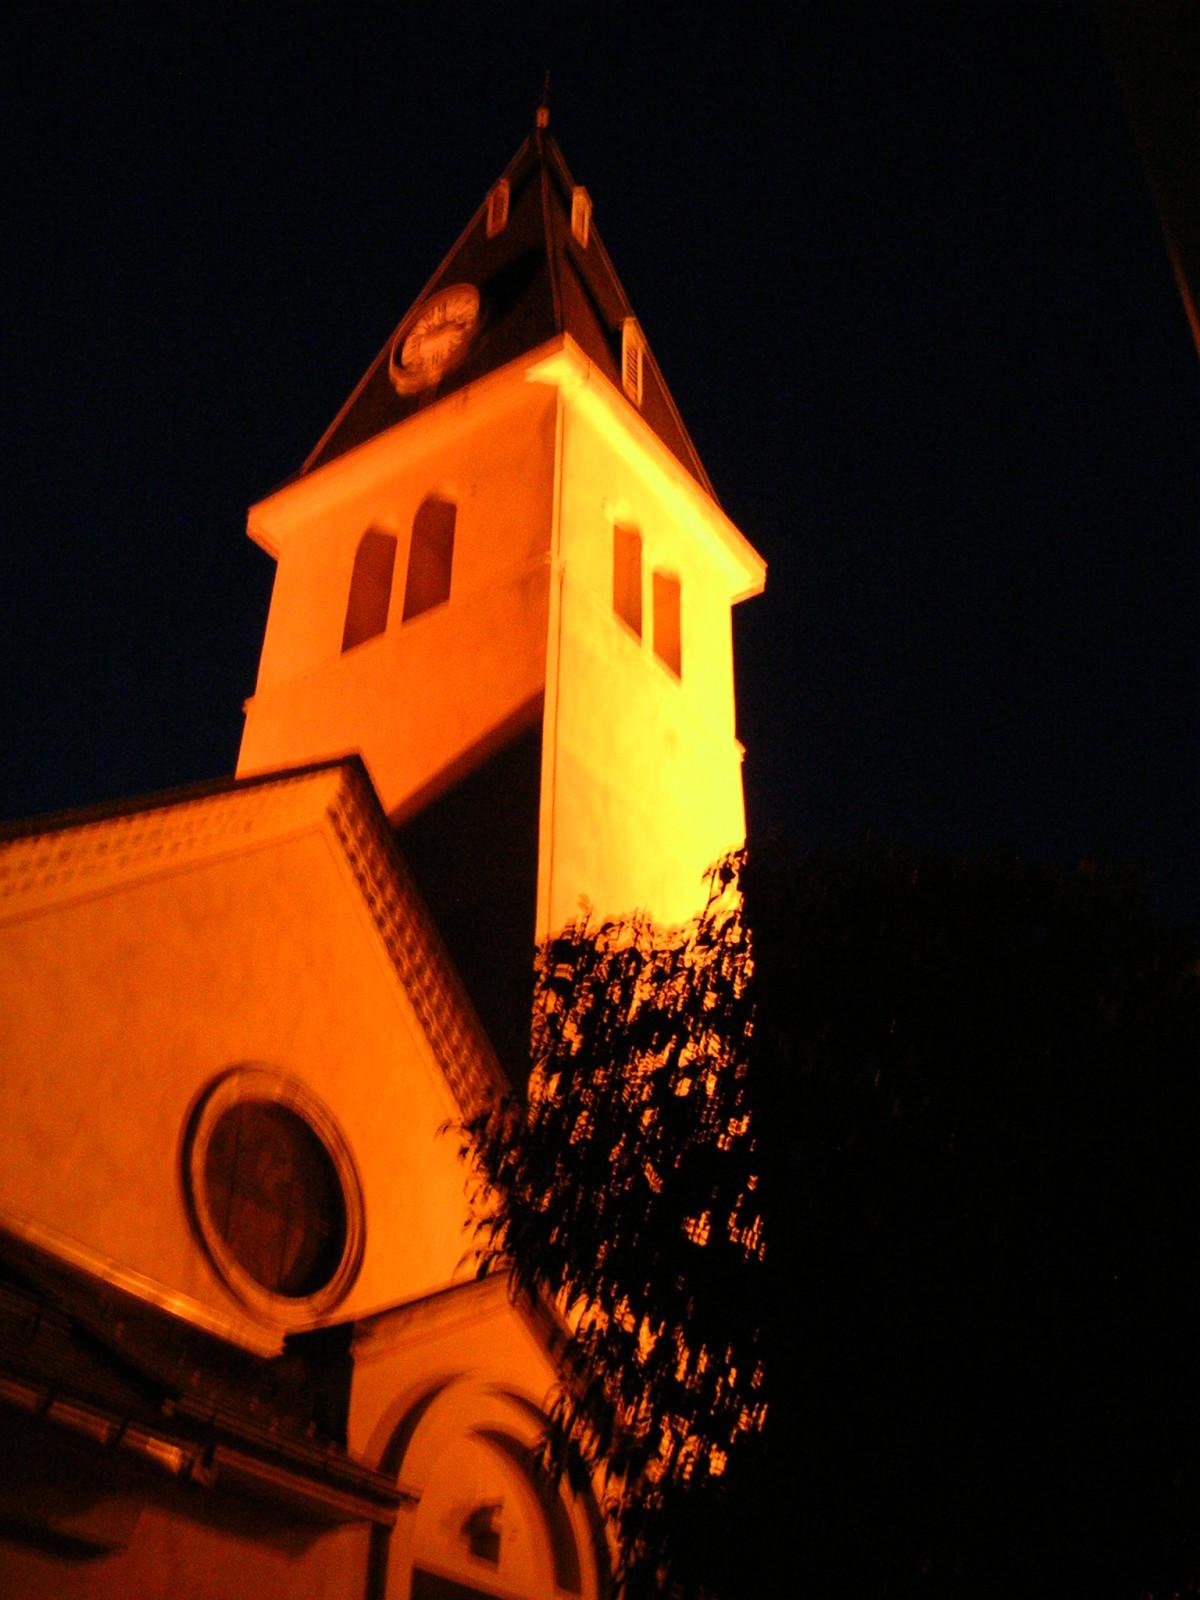 Saint-Bonnet-en-ChampsaurN4213.jpg